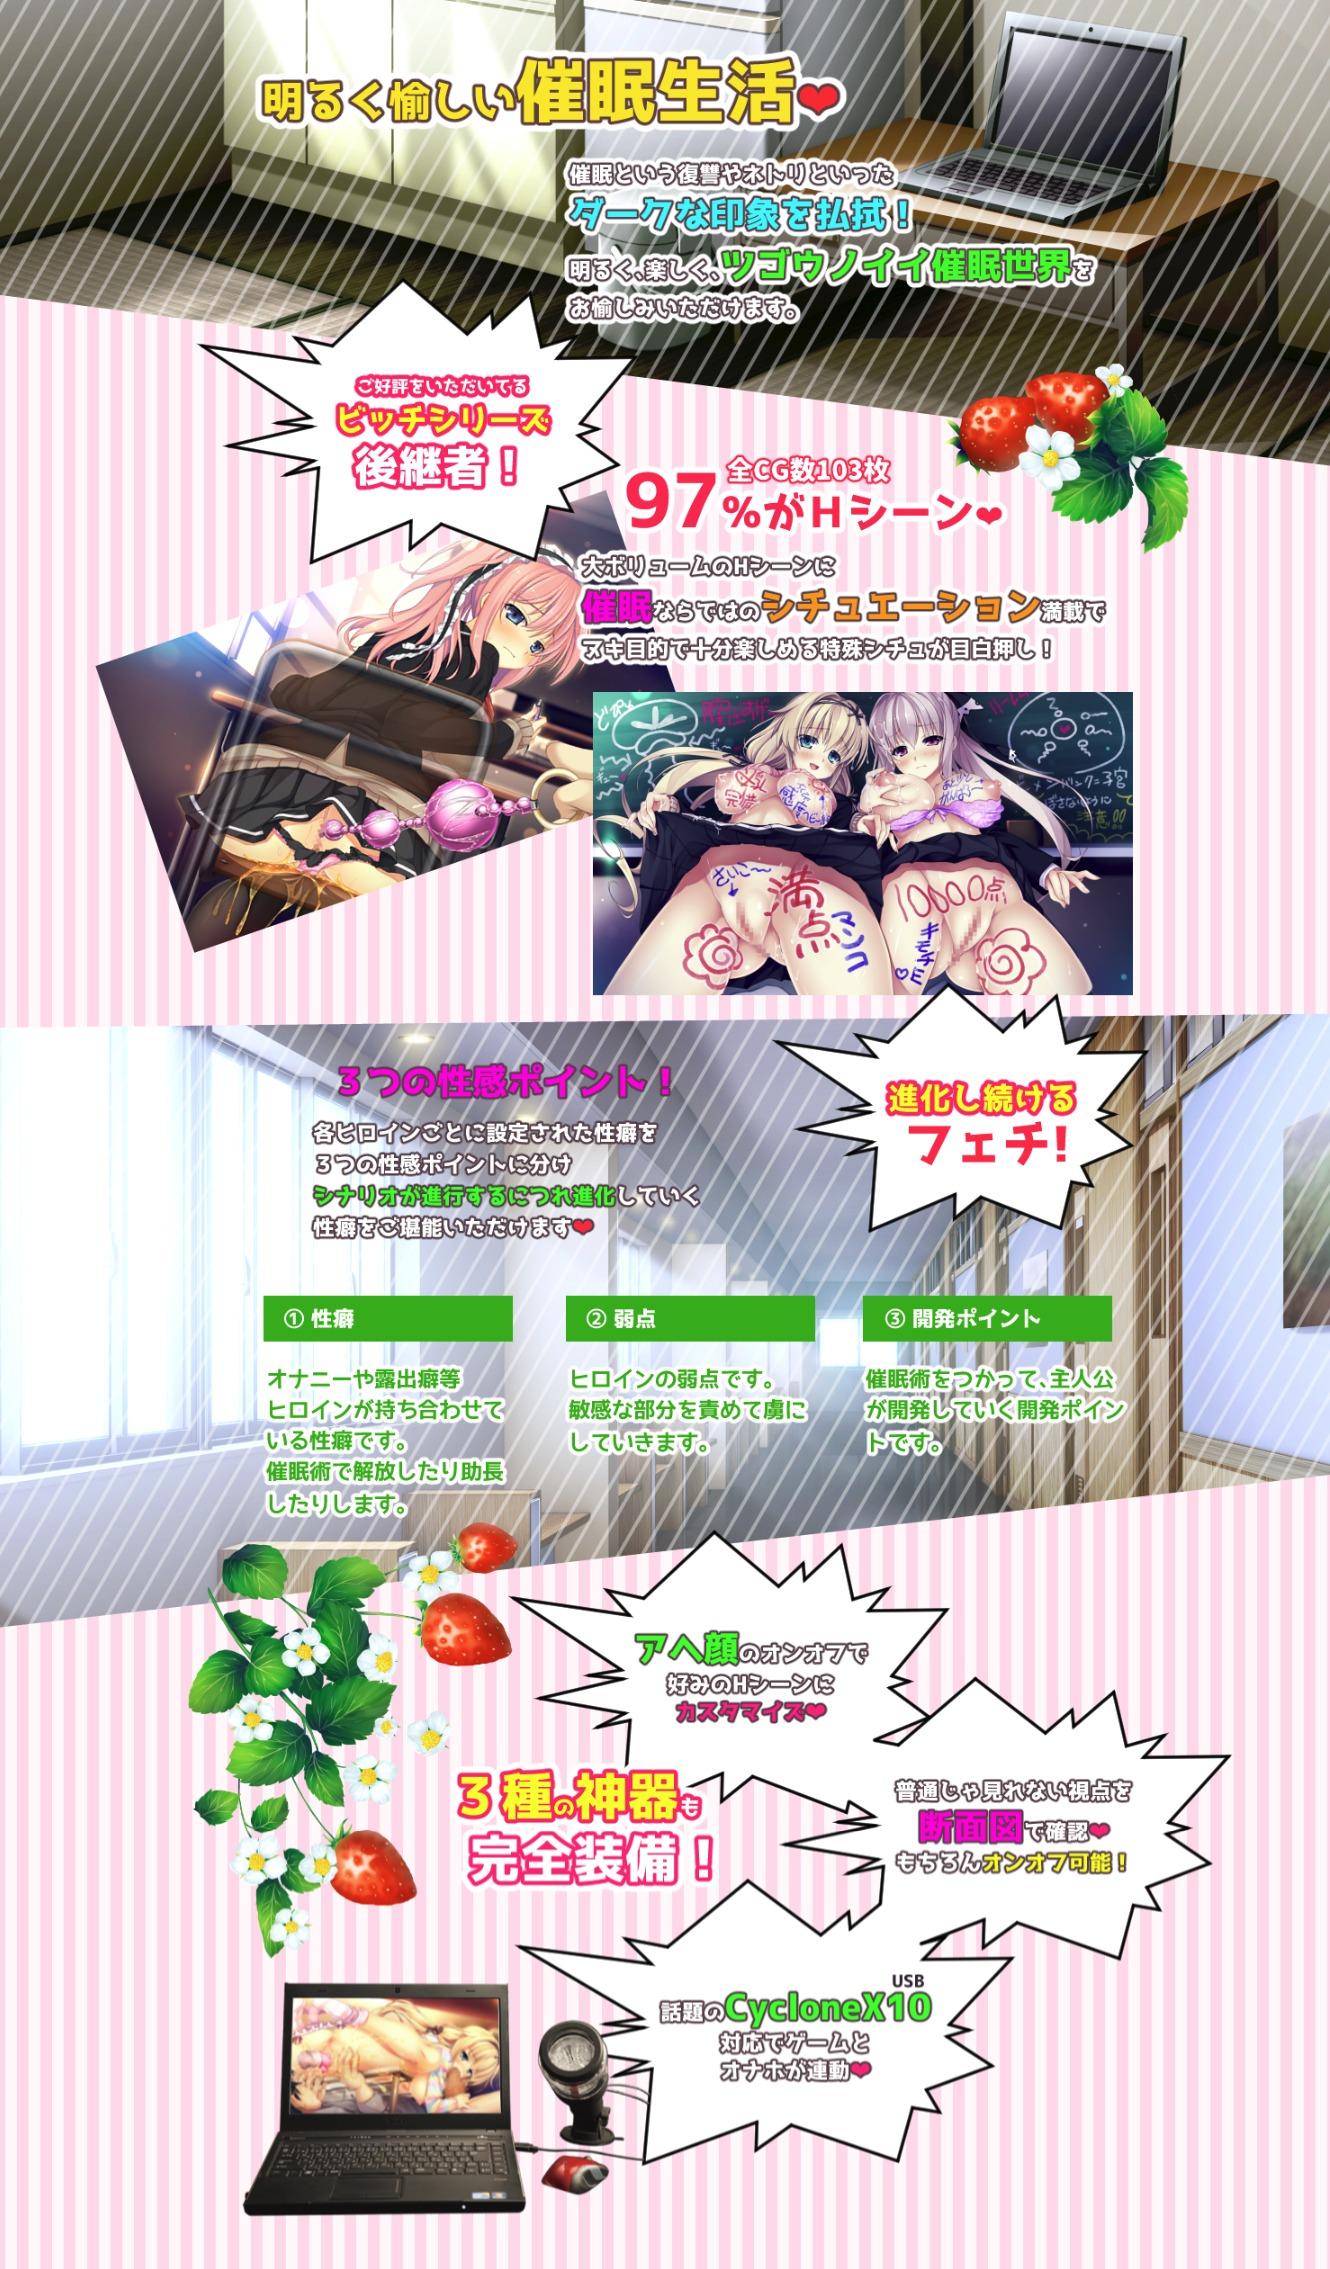 onomatope raspberry『ビッチ学園が清純なはずがないっ!!?』特設サイトa